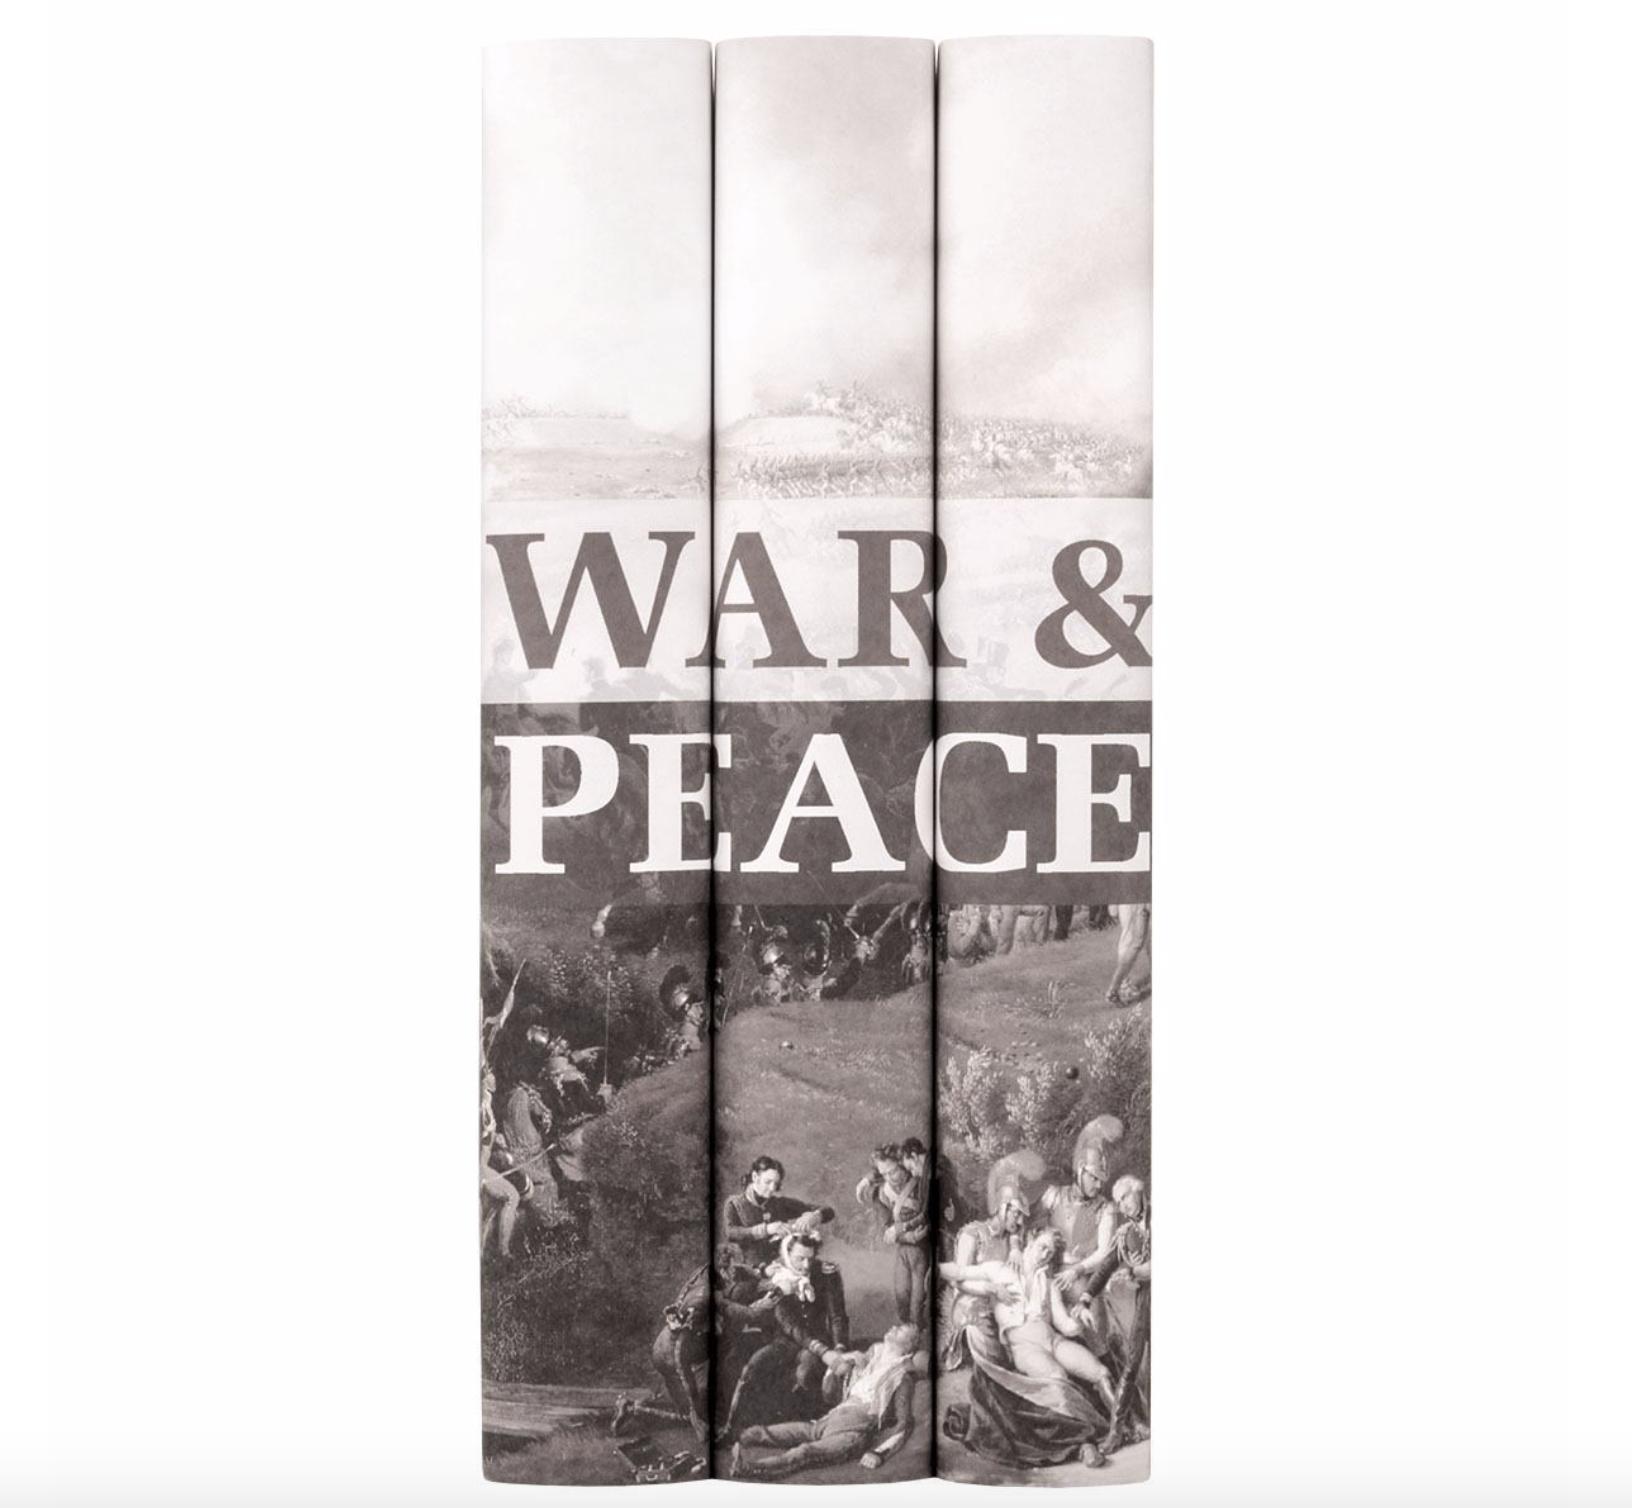 Juniper Tolstoy's War and Peace